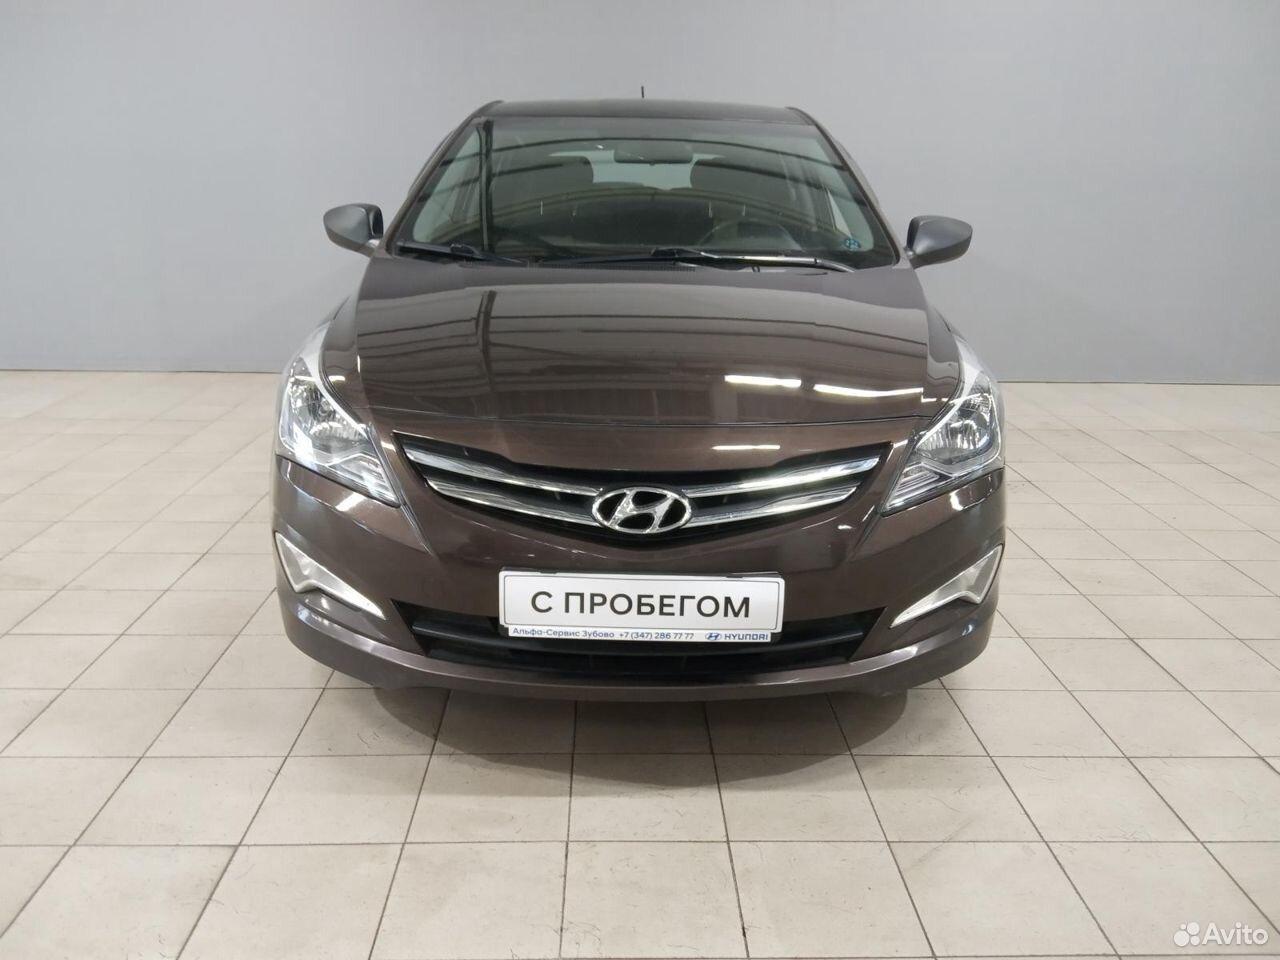 Hyundai Solaris, 2016  83472017002 купить 2